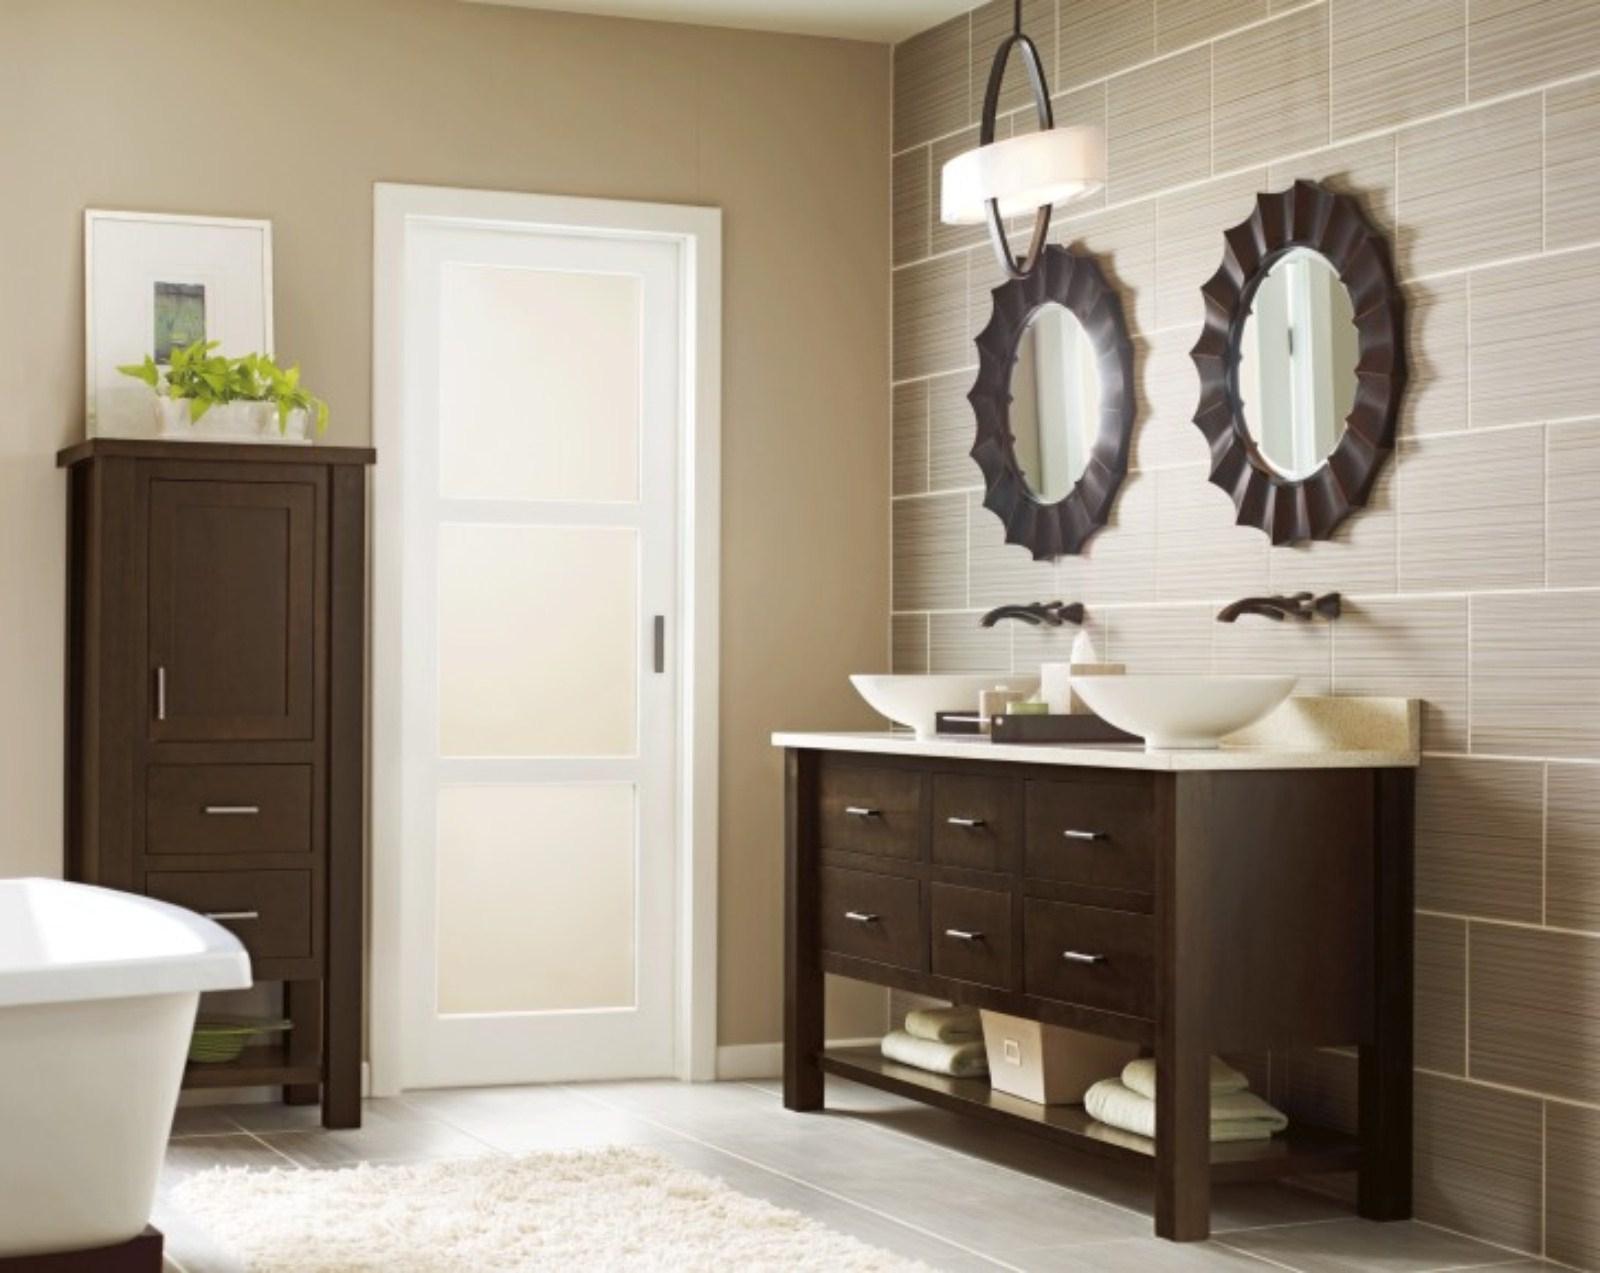 Preferred Top 35 Skookum Bathroom Vanity Mirrors Framed Long Wall Intended For Wall Mirrors For Bathroom Vanities (View 11 of 20)